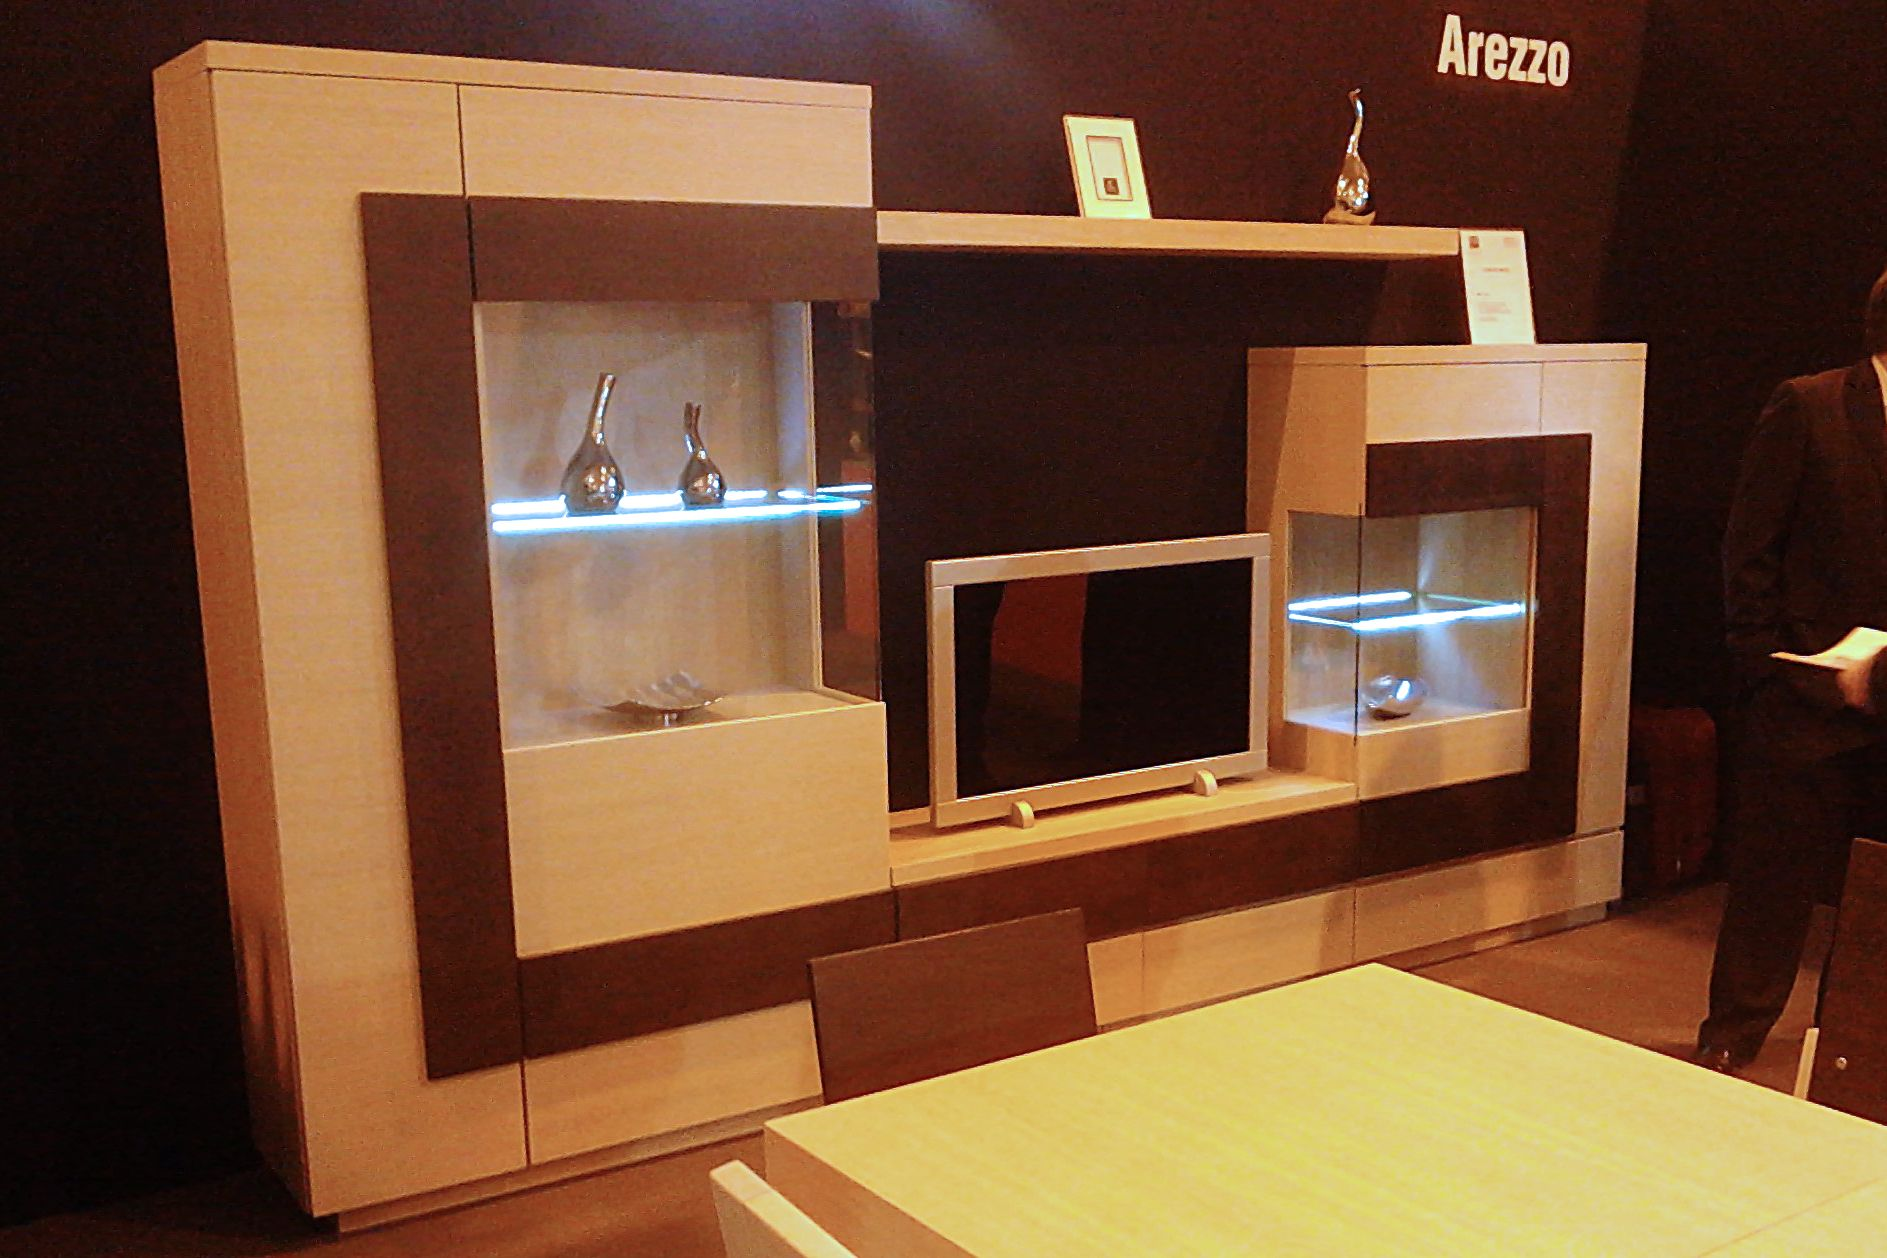 Mueble de sal n de moprimsa feria del mueble de zaragoza for Muebles de salon zaragoza